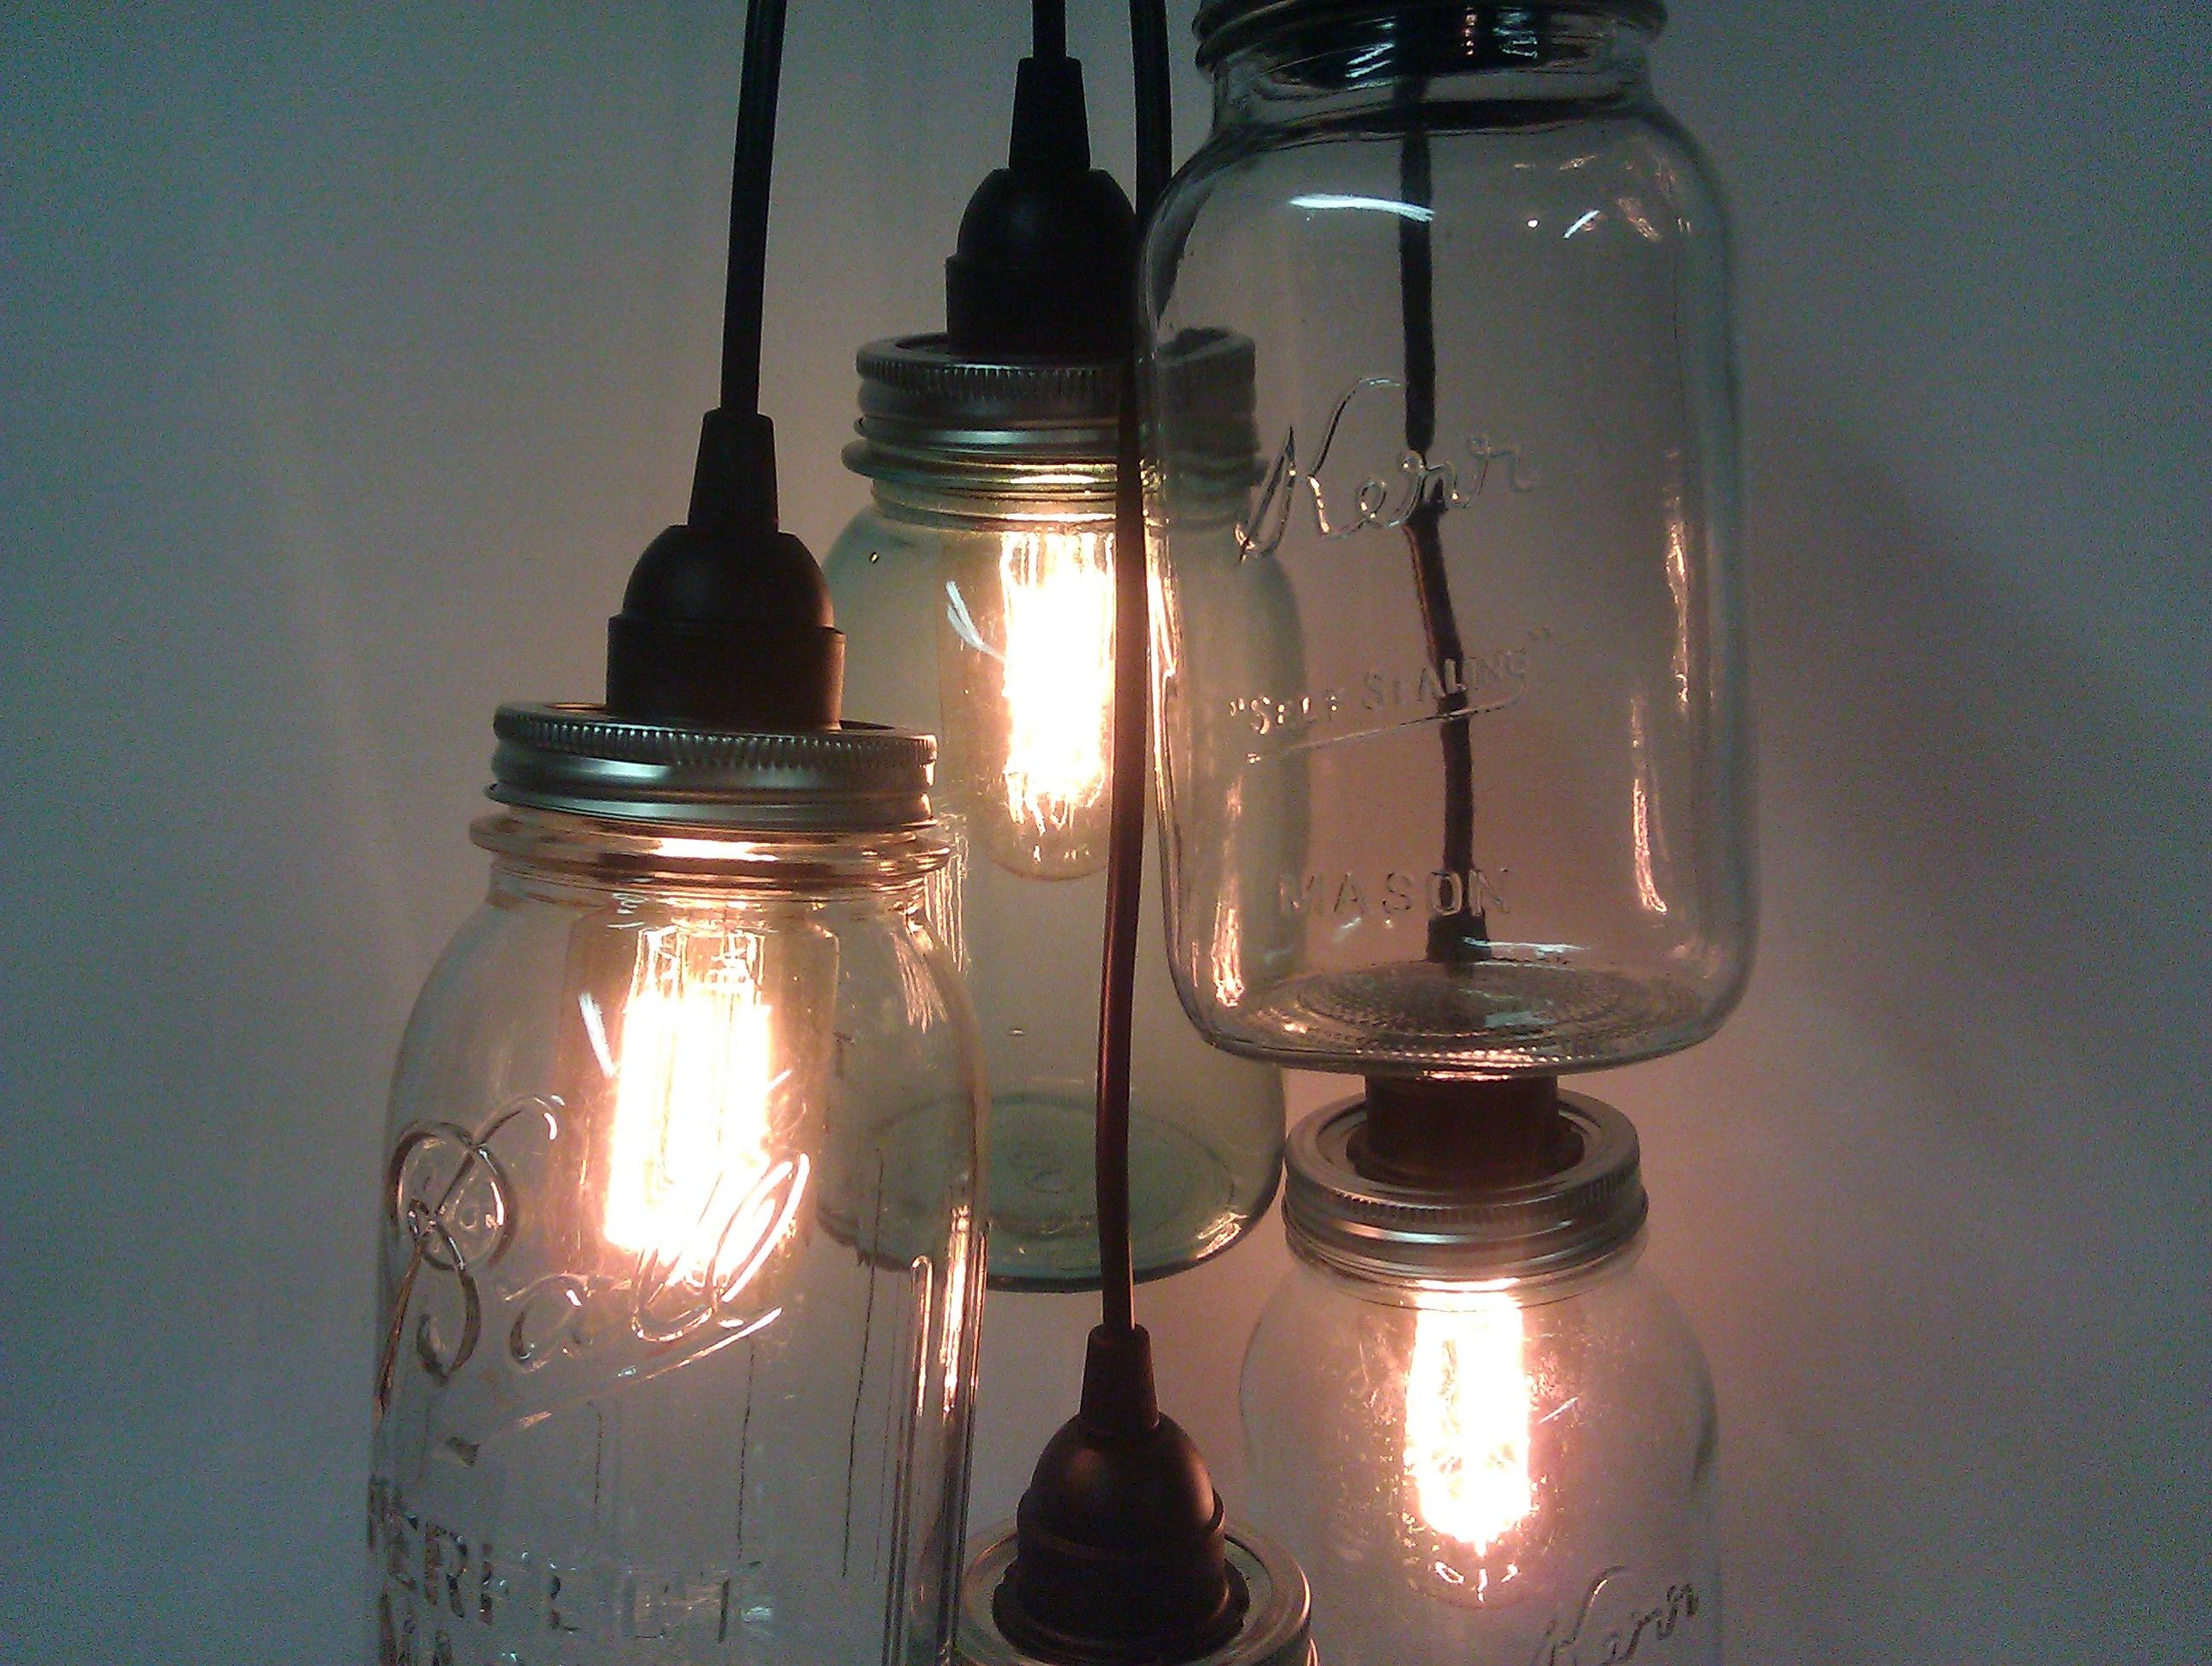 Wine Bottle Lamp Diy Astonishing Diy Projects With Wine Bottles Jar Cluster Pendant